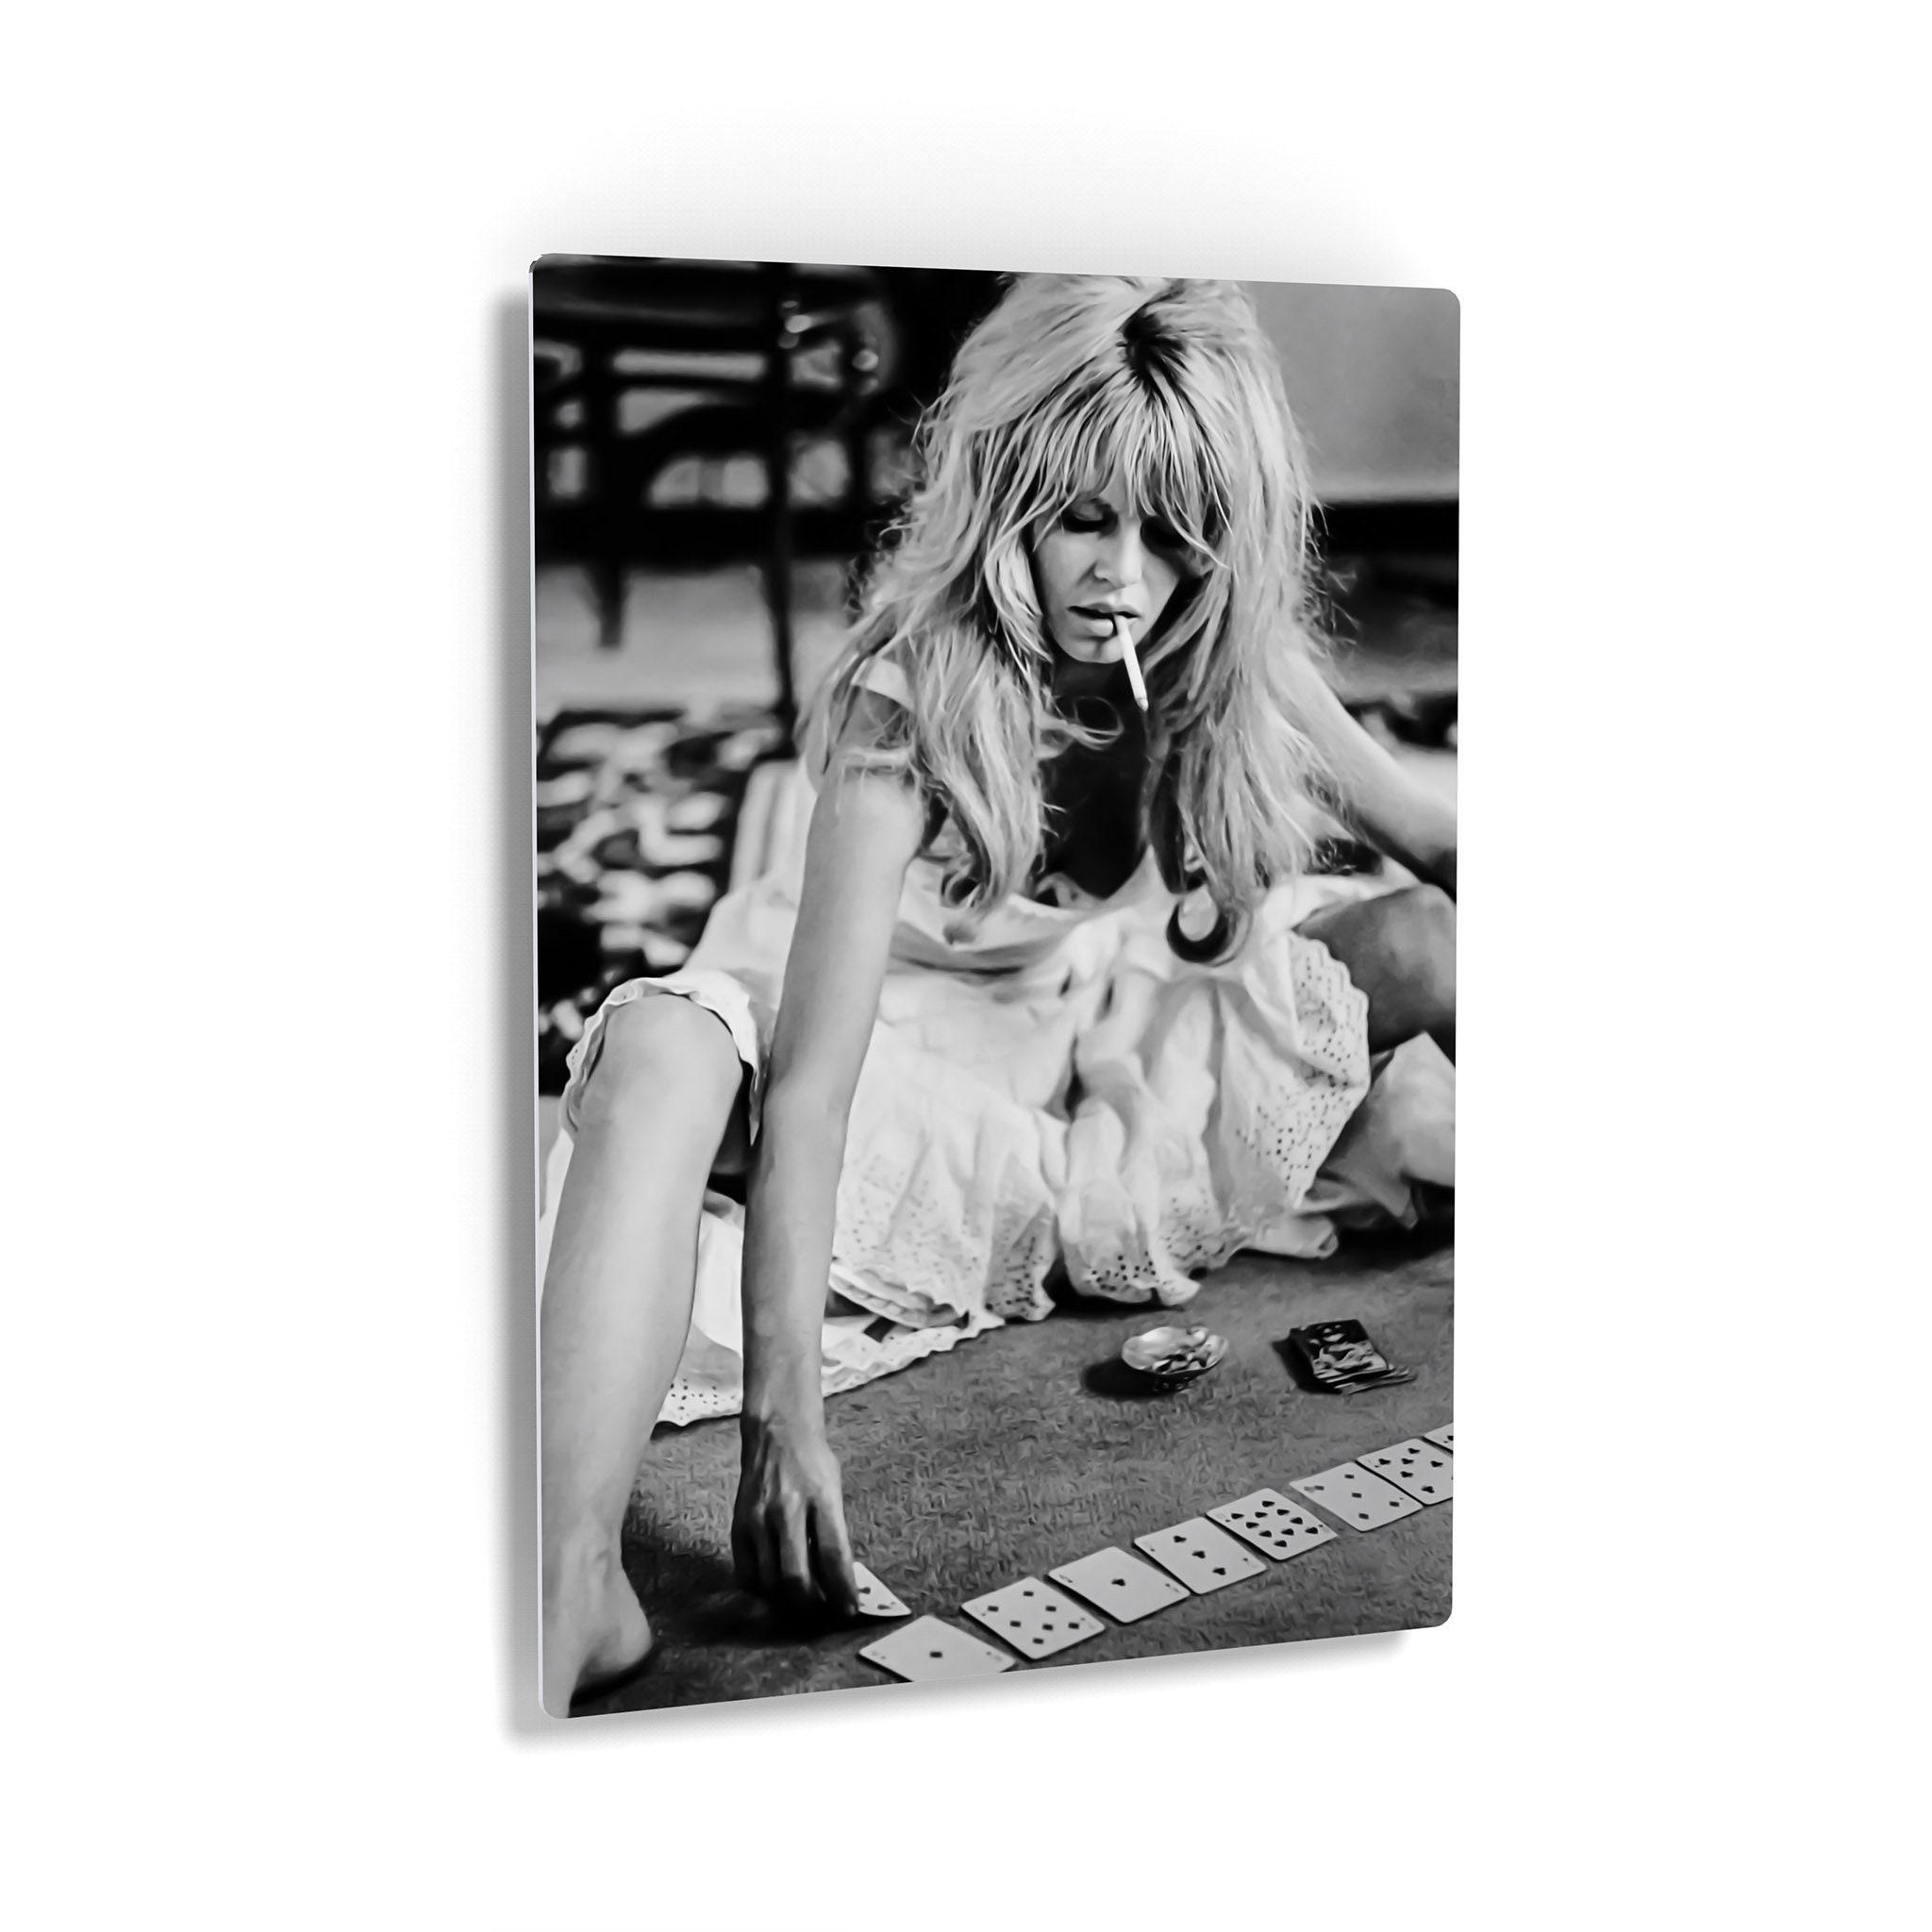 Brigitte Bardot Poster Brigitte Bardot Playing Cards Vintage Photo Wall Art